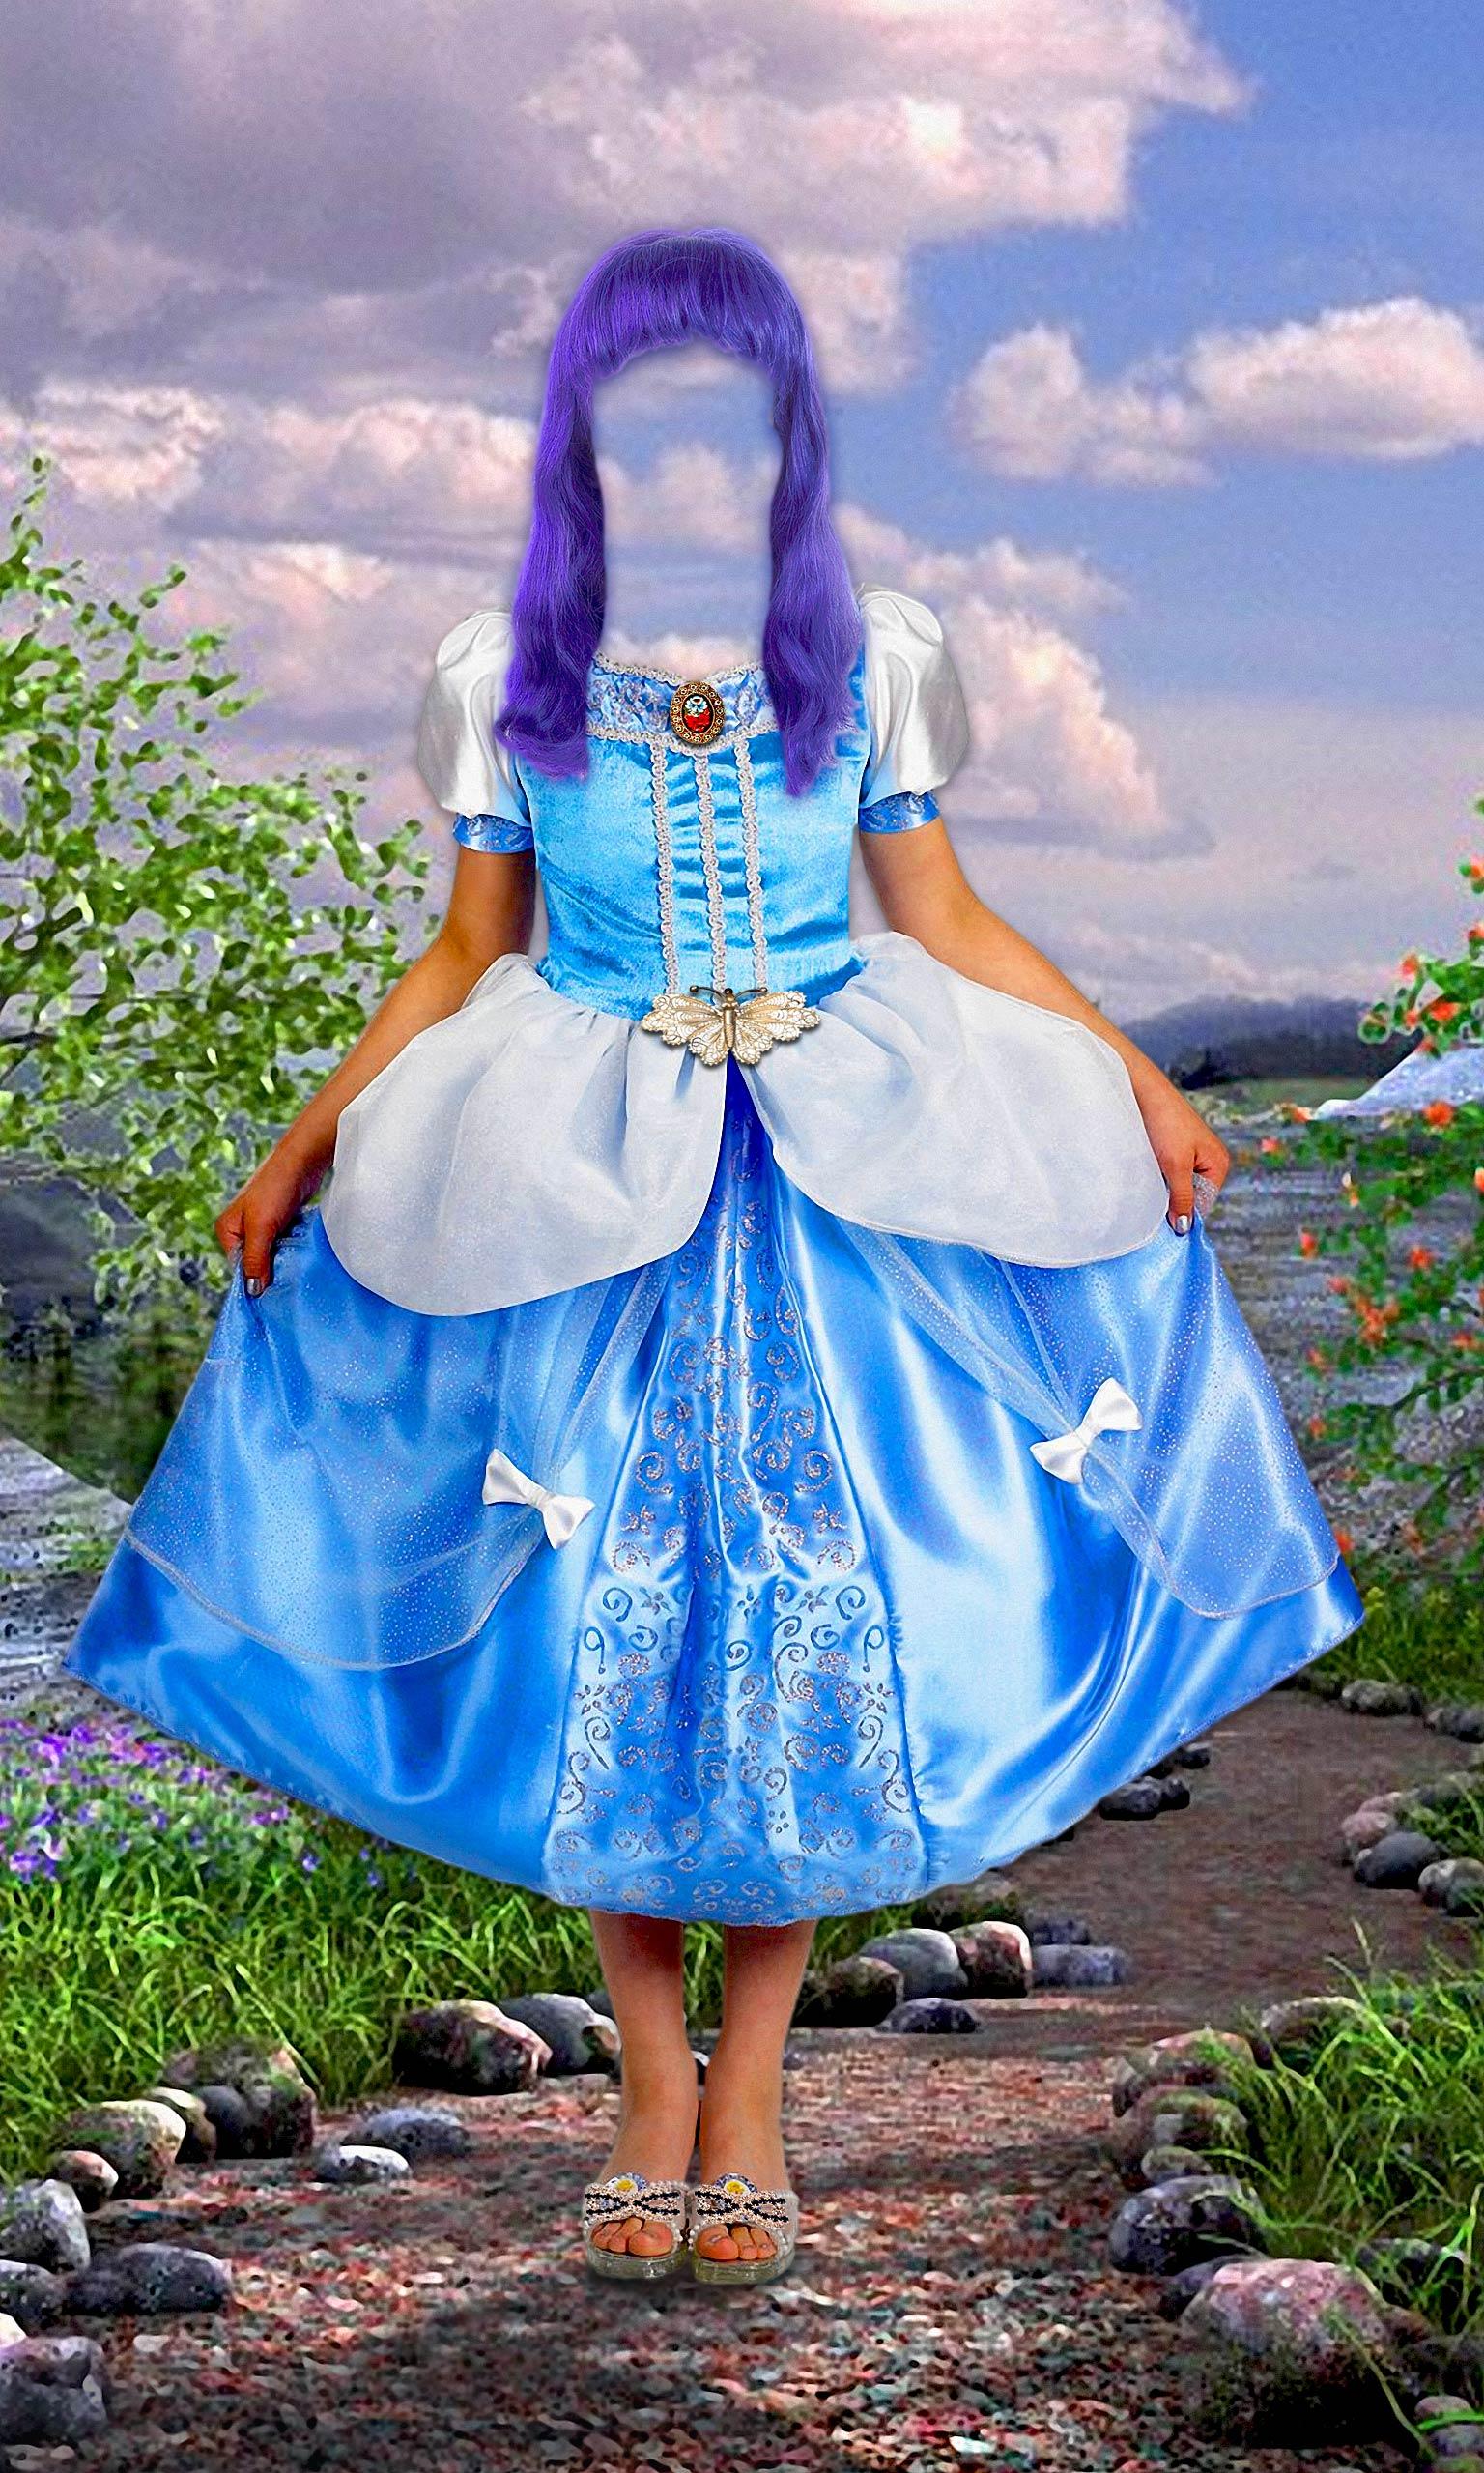 Шаблон для фотомонтажа.  Формат: PSD Размер: 5 мб.  Девочка в голубом платье.